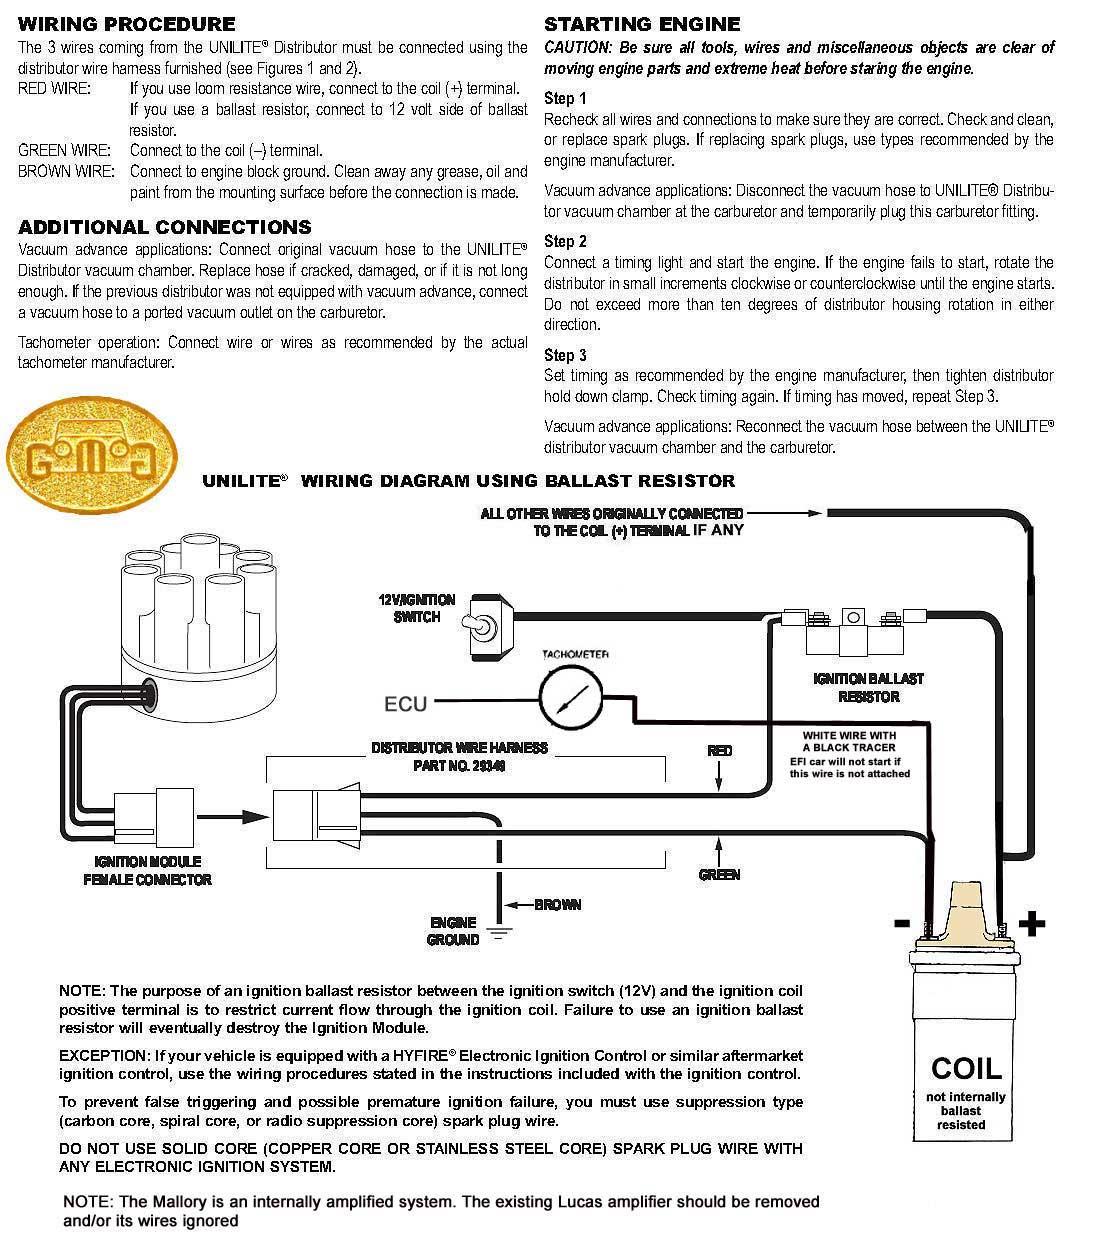 mallory unilite wiring diagram whirlpool gas dryer motor magnetic breakerless library